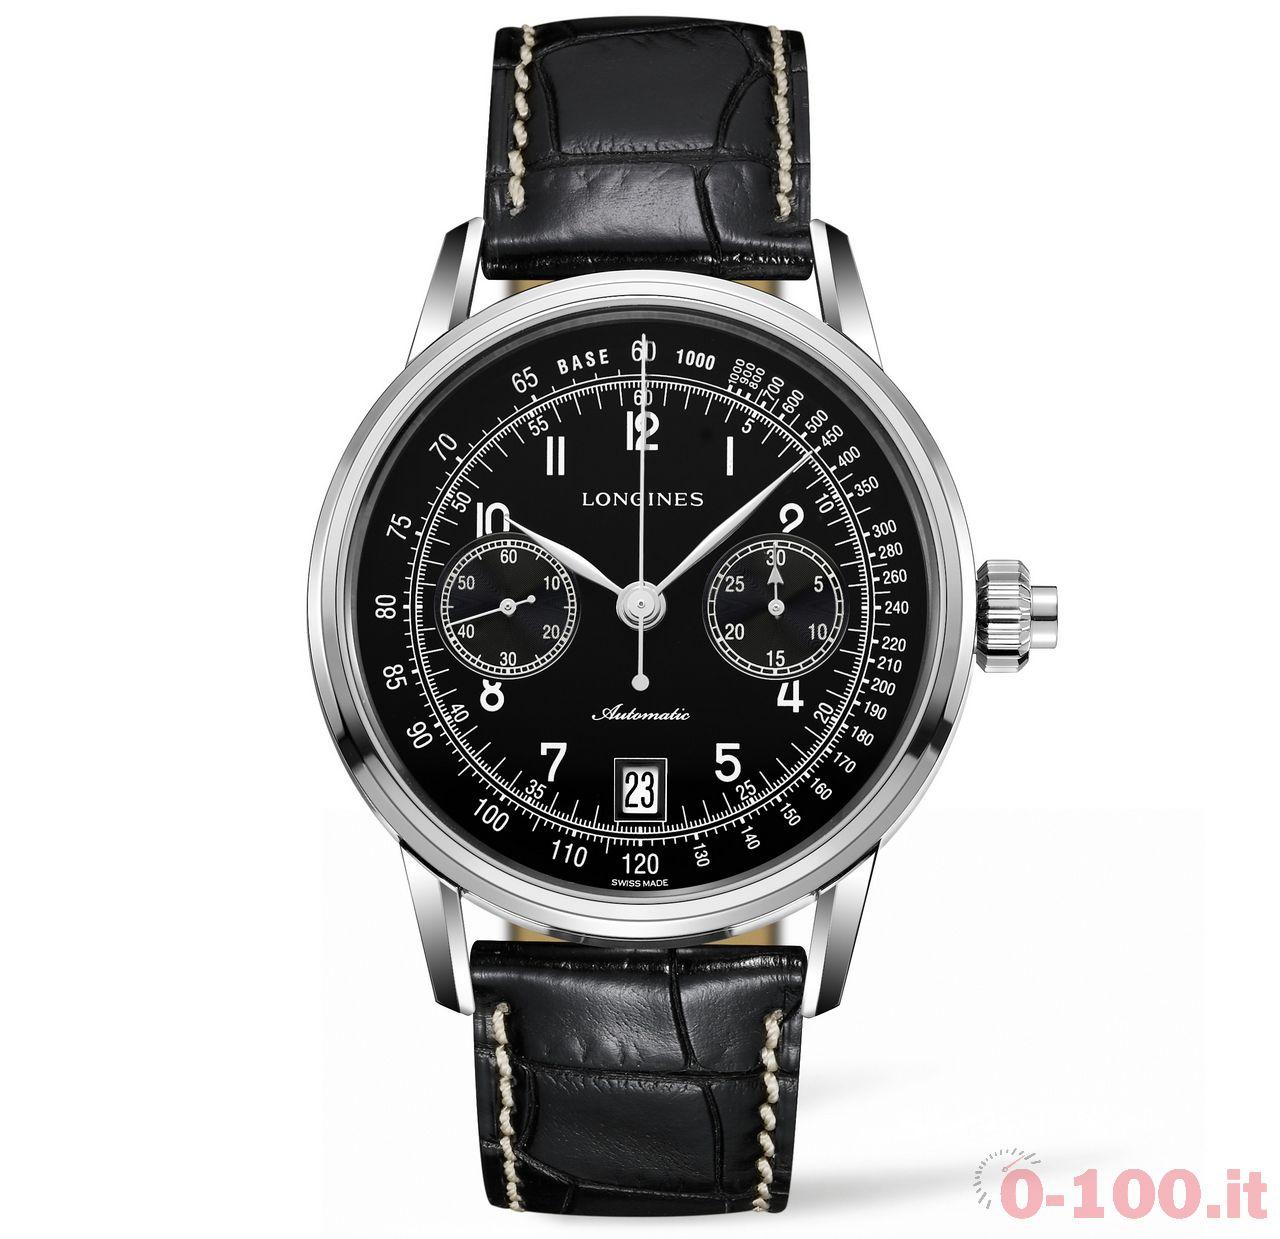 longines-column-wheel-single-push-piece-chronograph-price_0-1004